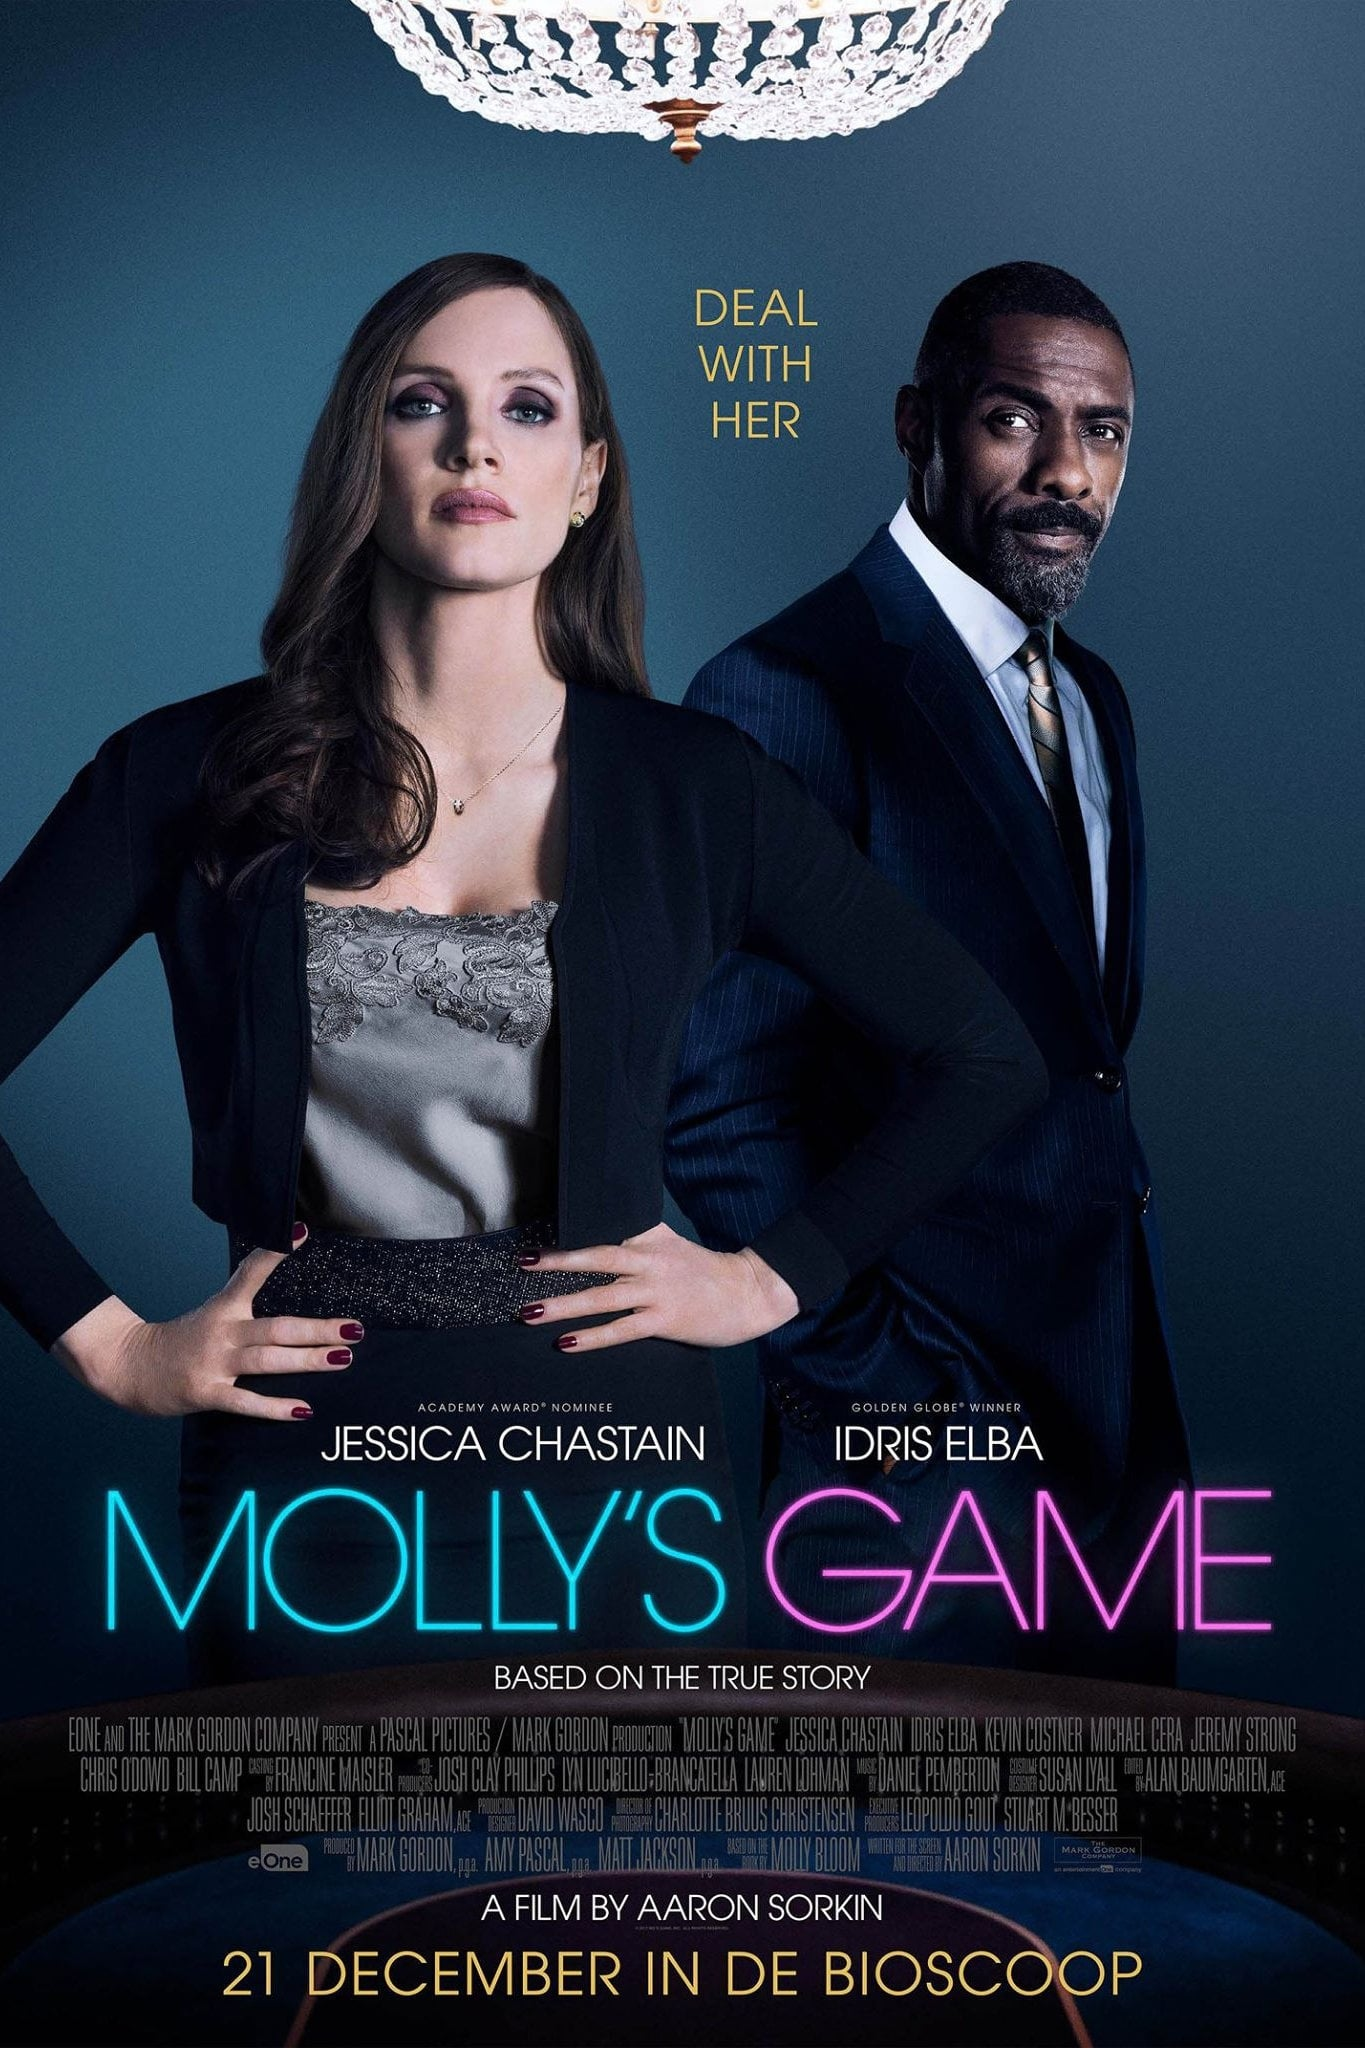 Poster and image movie Film Jocuri secrete - Molly's Game - Molly's Game - Molly's Game -  2017